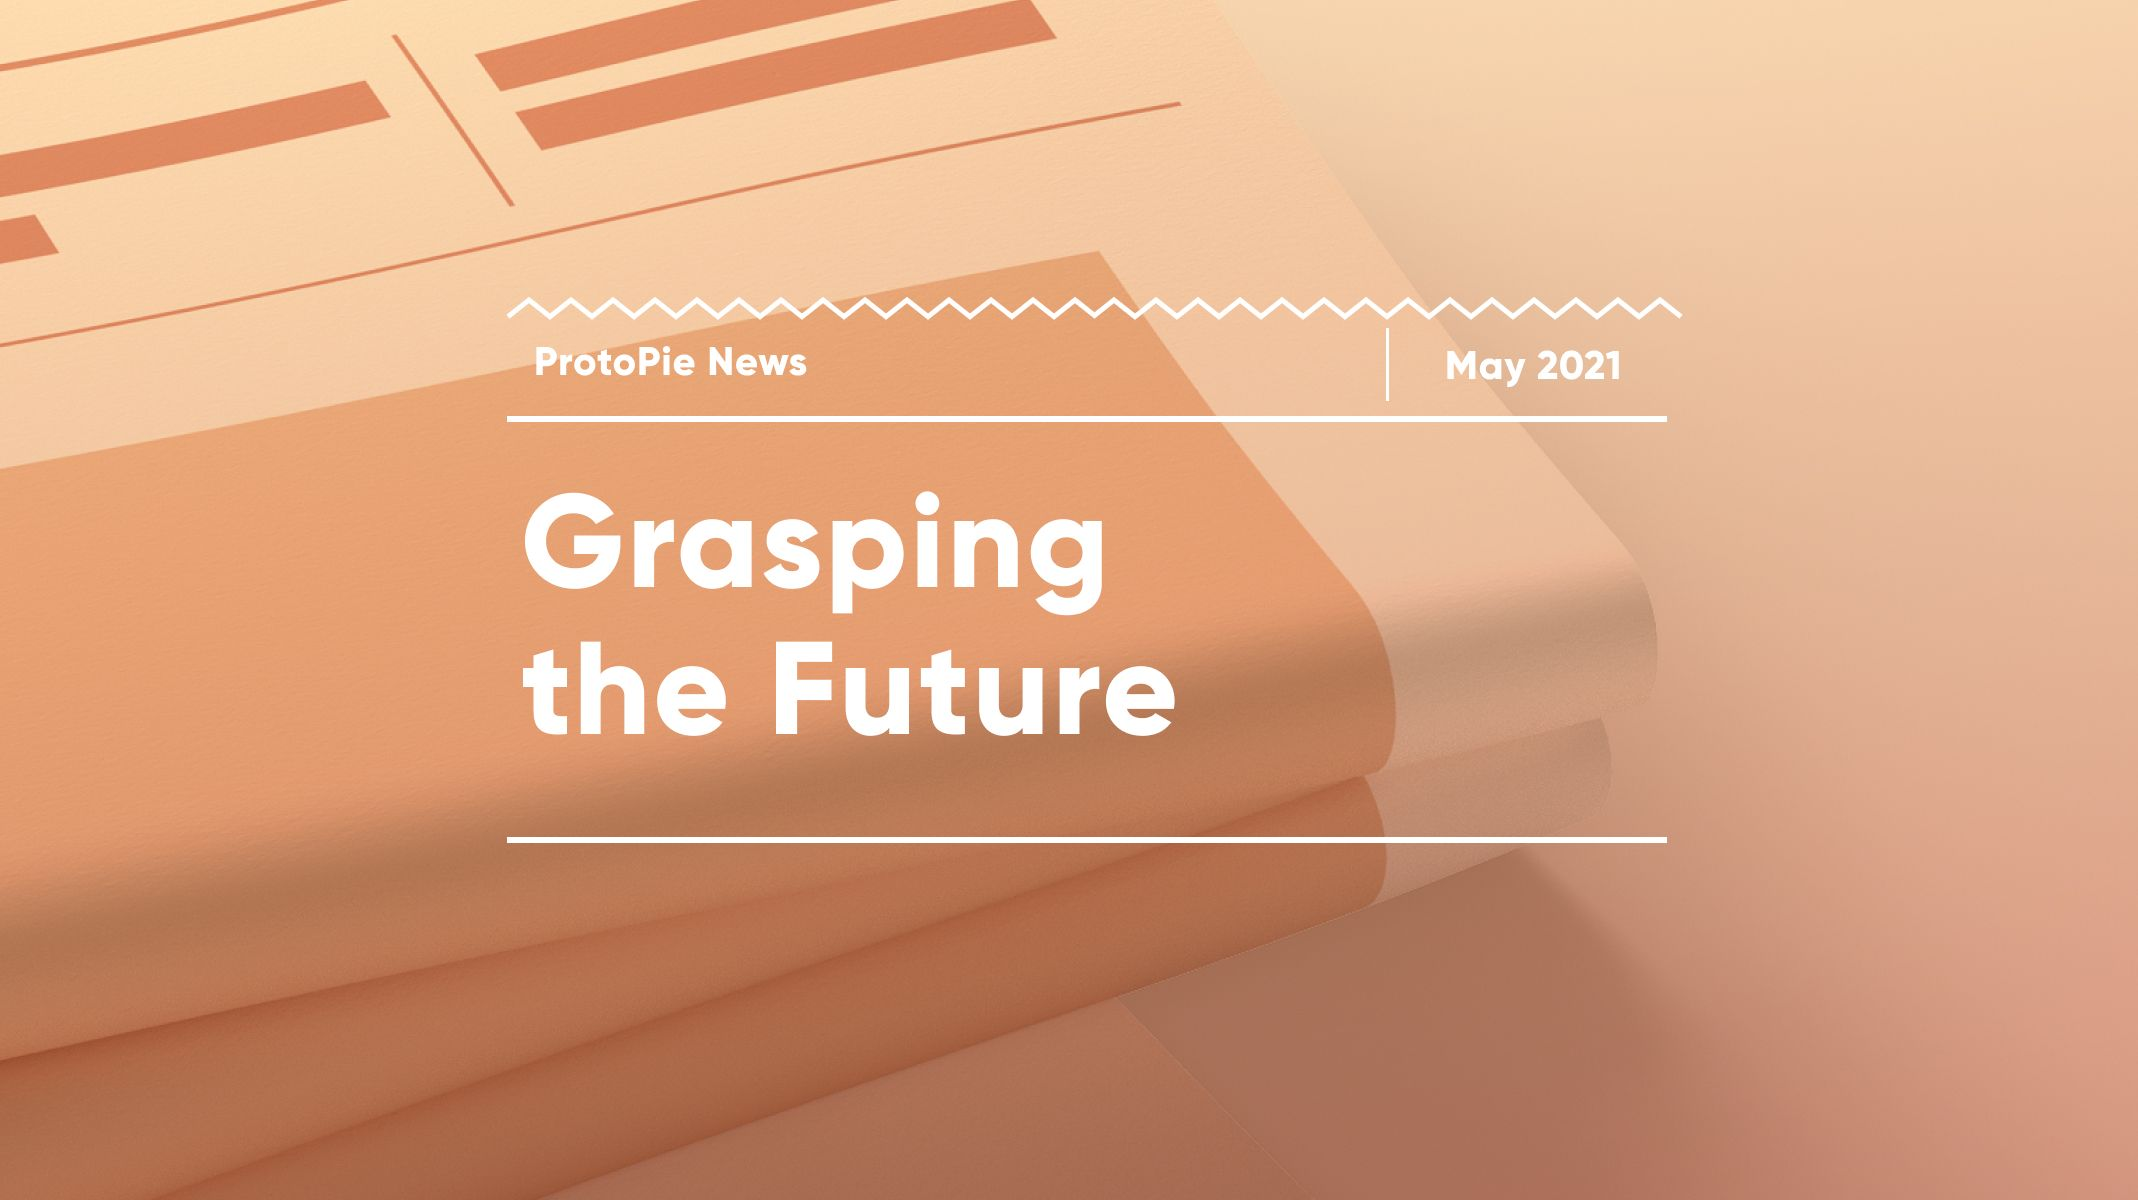 grasping the future thumbnail